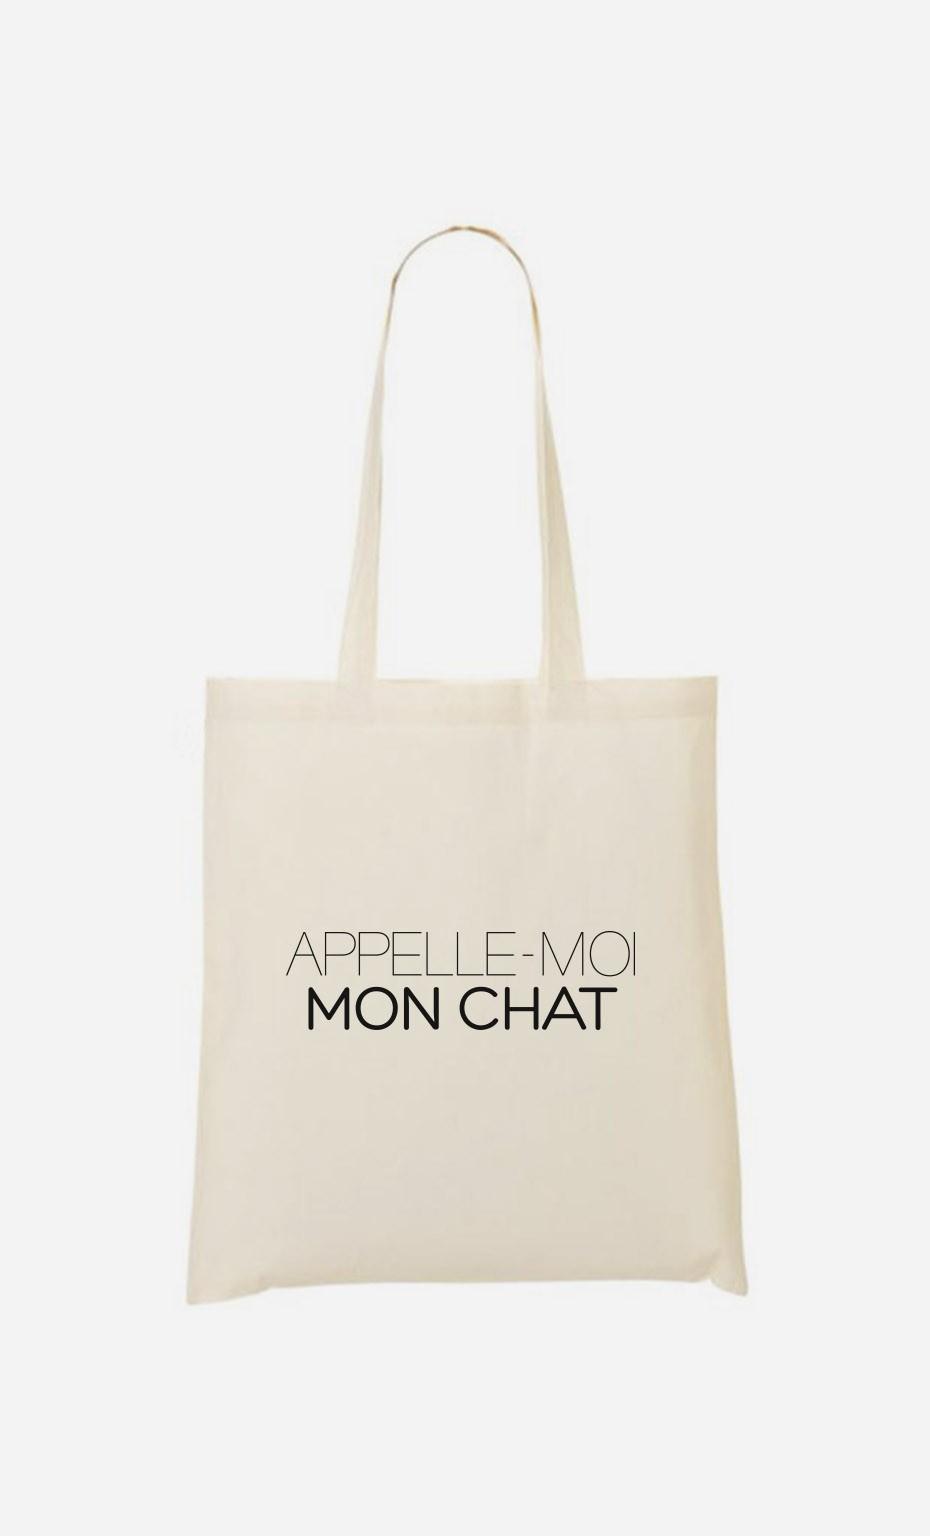 Tote Bag Appelle-Moi Mon Chat